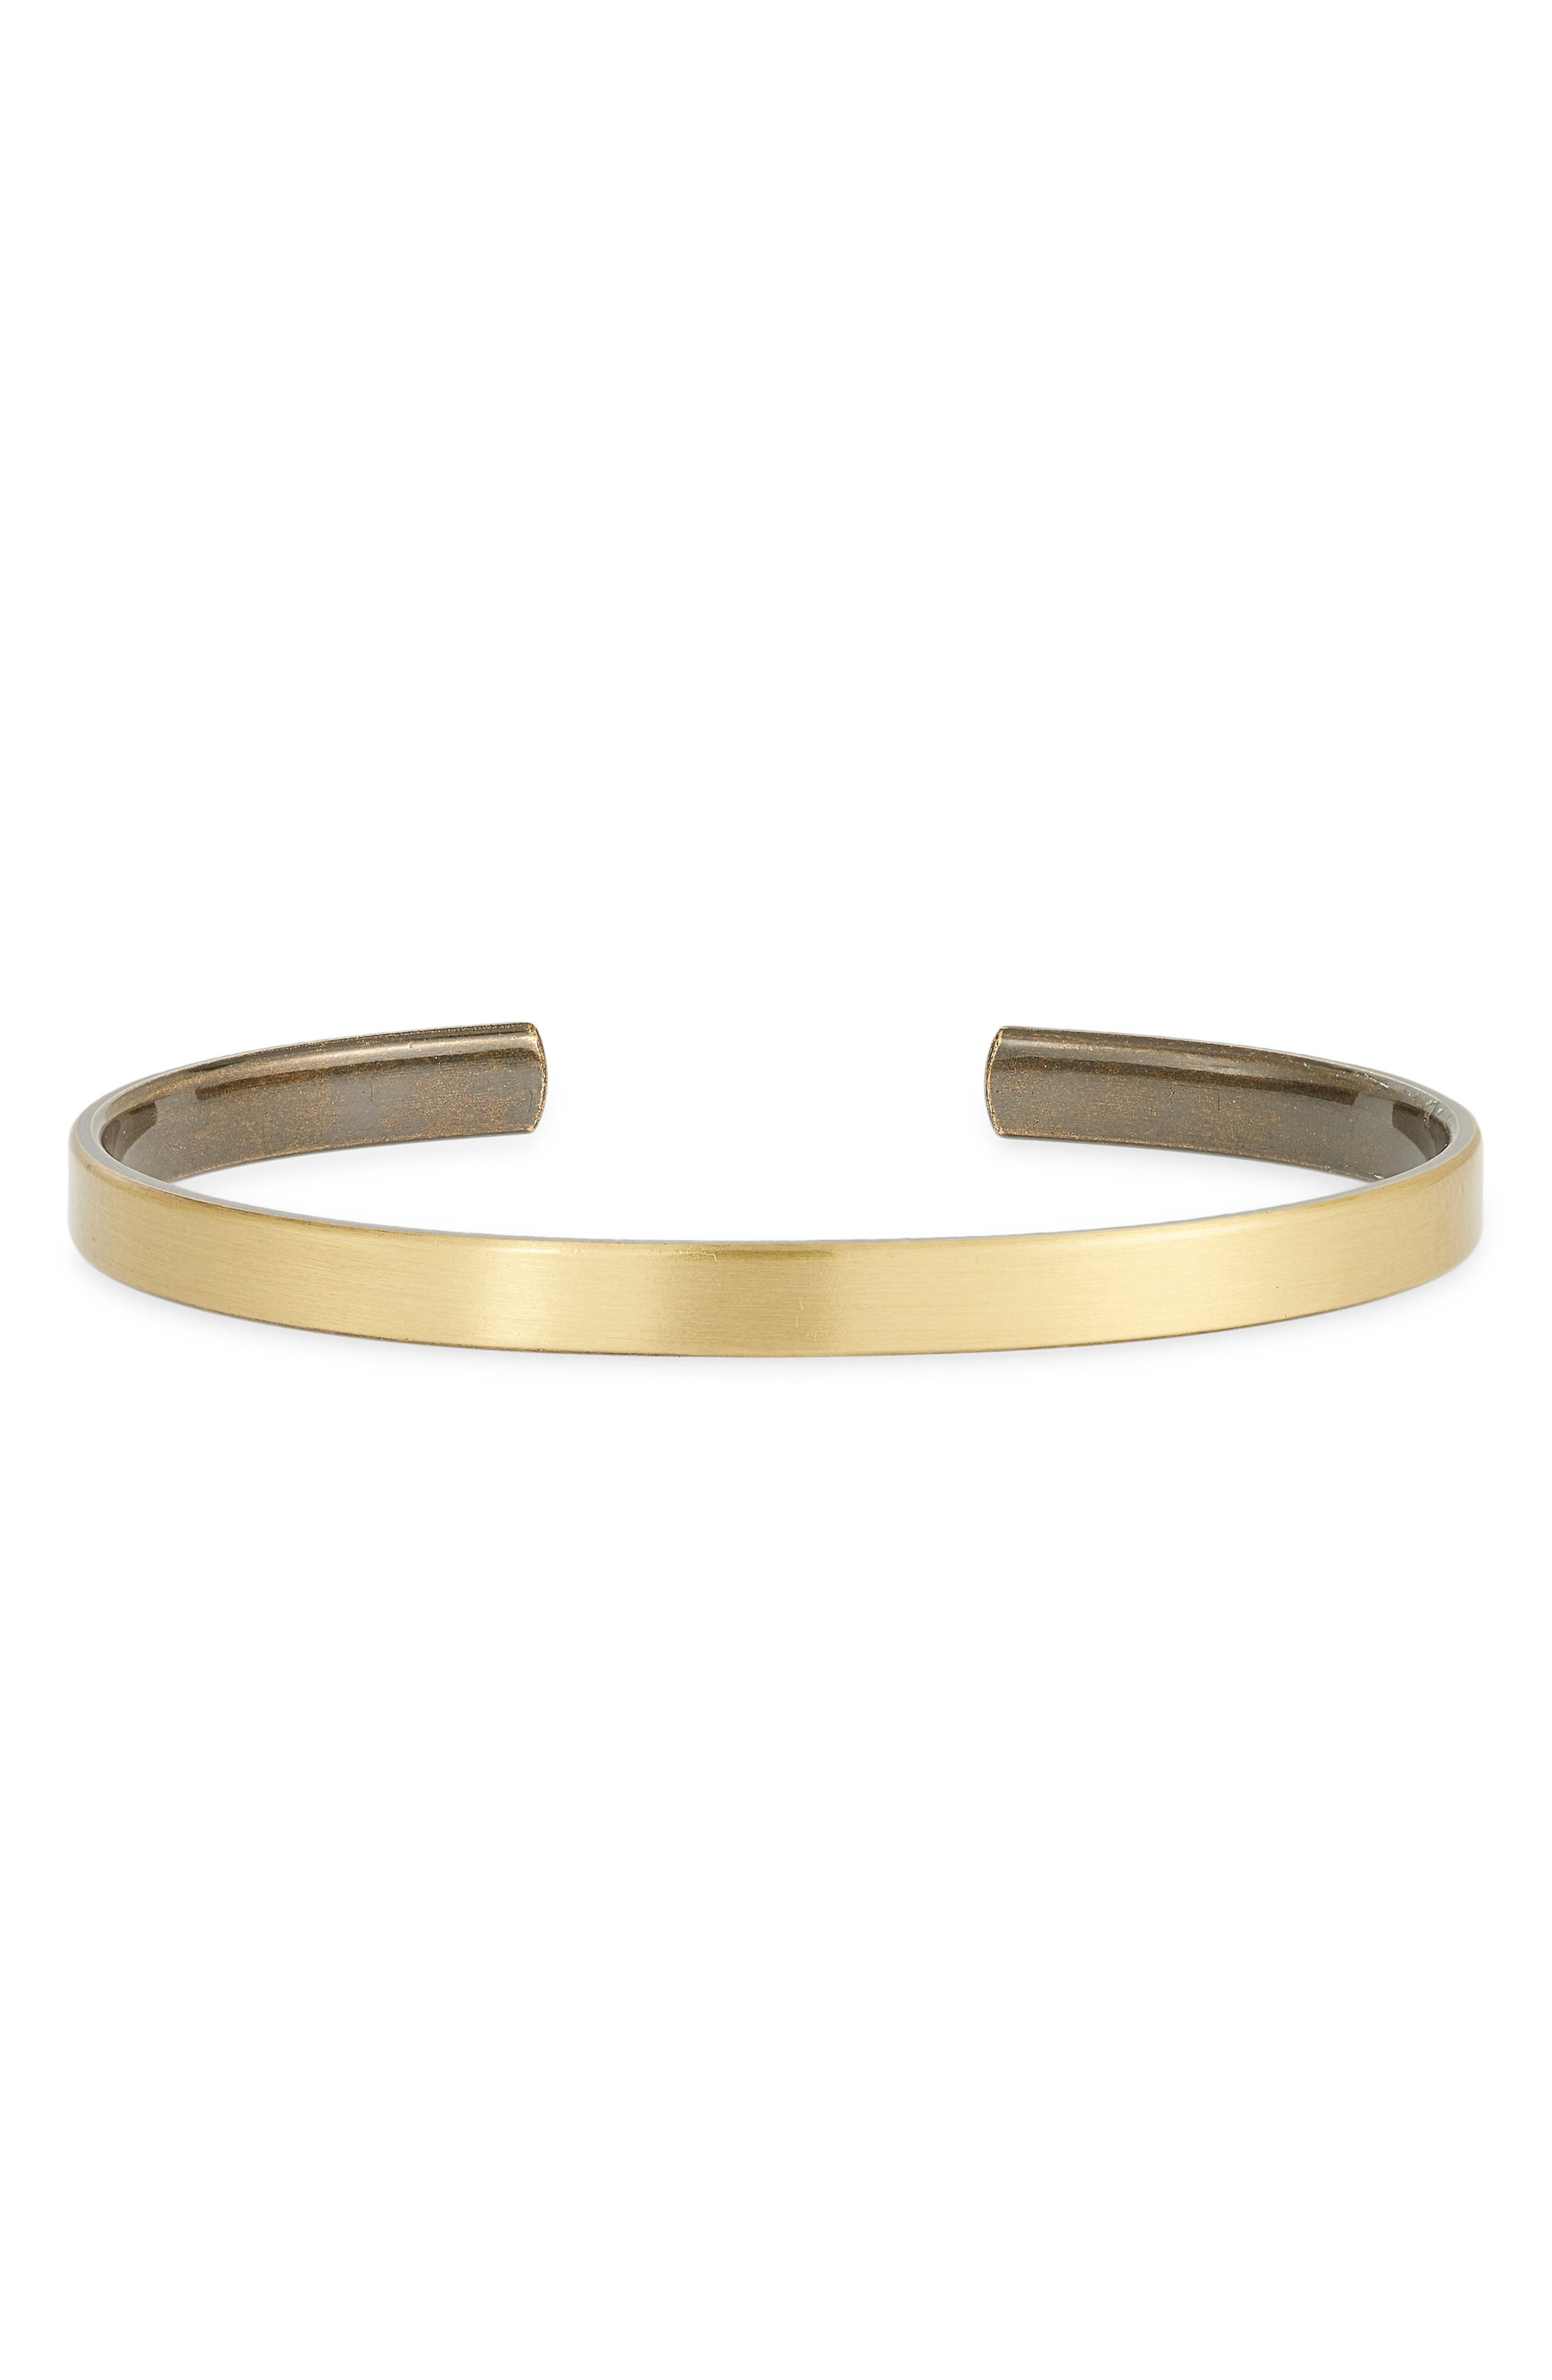 Men's Clean Cuff Bracelet